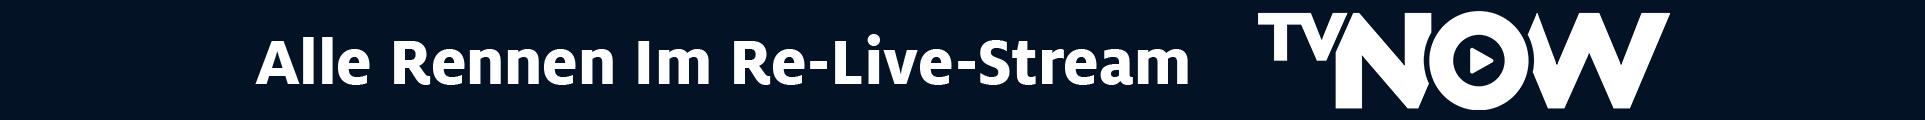 Sponsor: TVNOW.de Relive